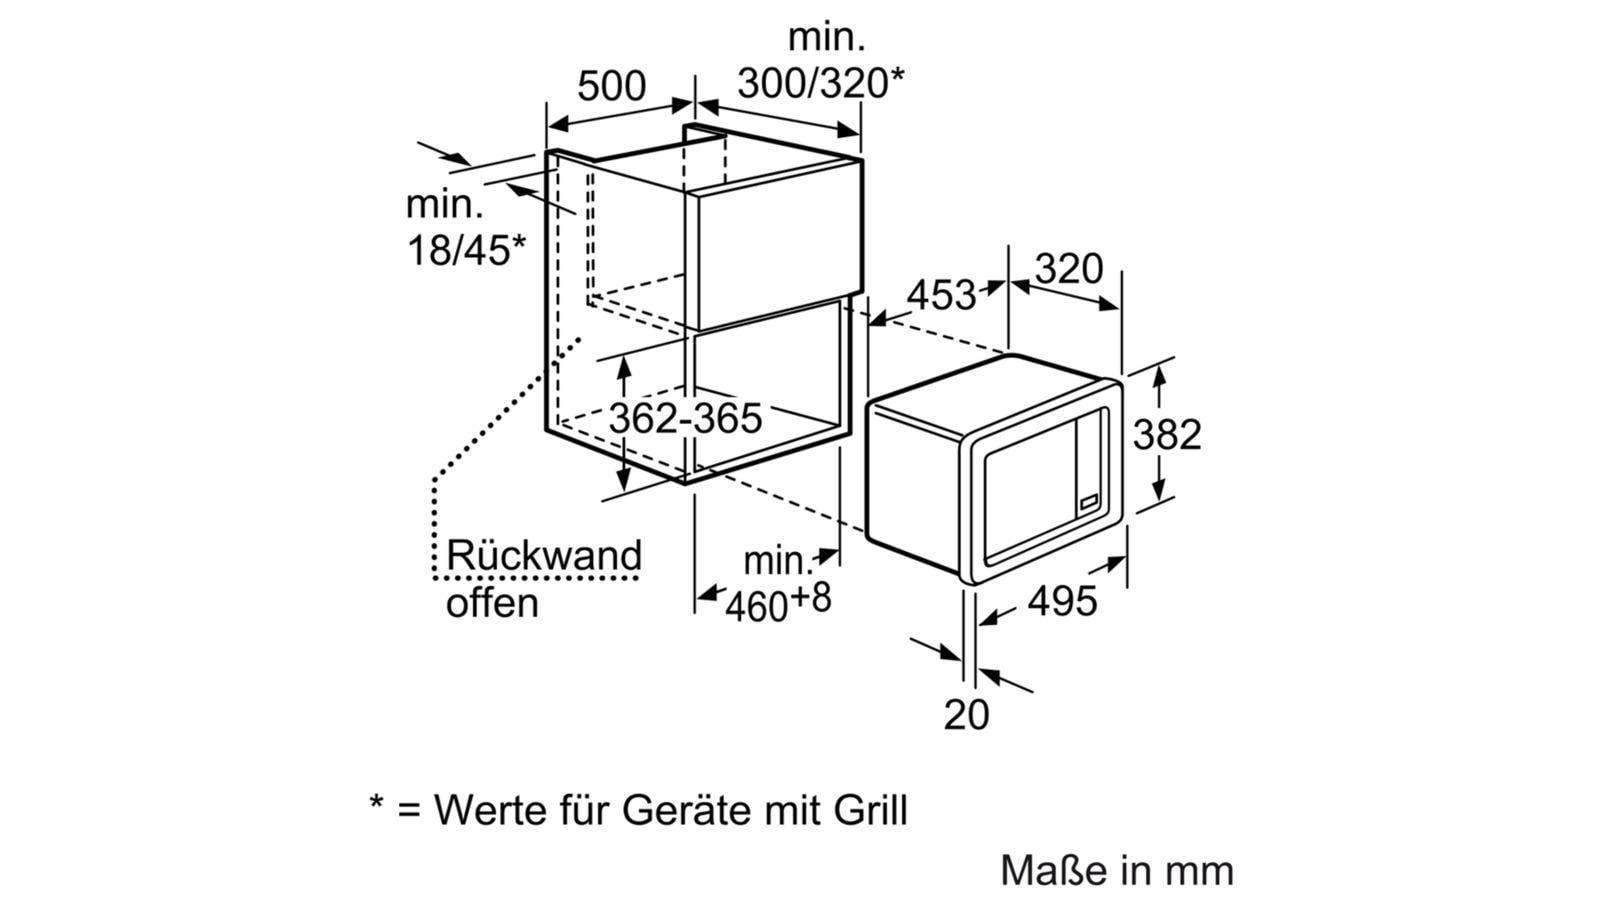 einbau mikrowelle neff hw5350n h53w50n3 edelstahl von neff bei elektroshop wagner. Black Bedroom Furniture Sets. Home Design Ideas